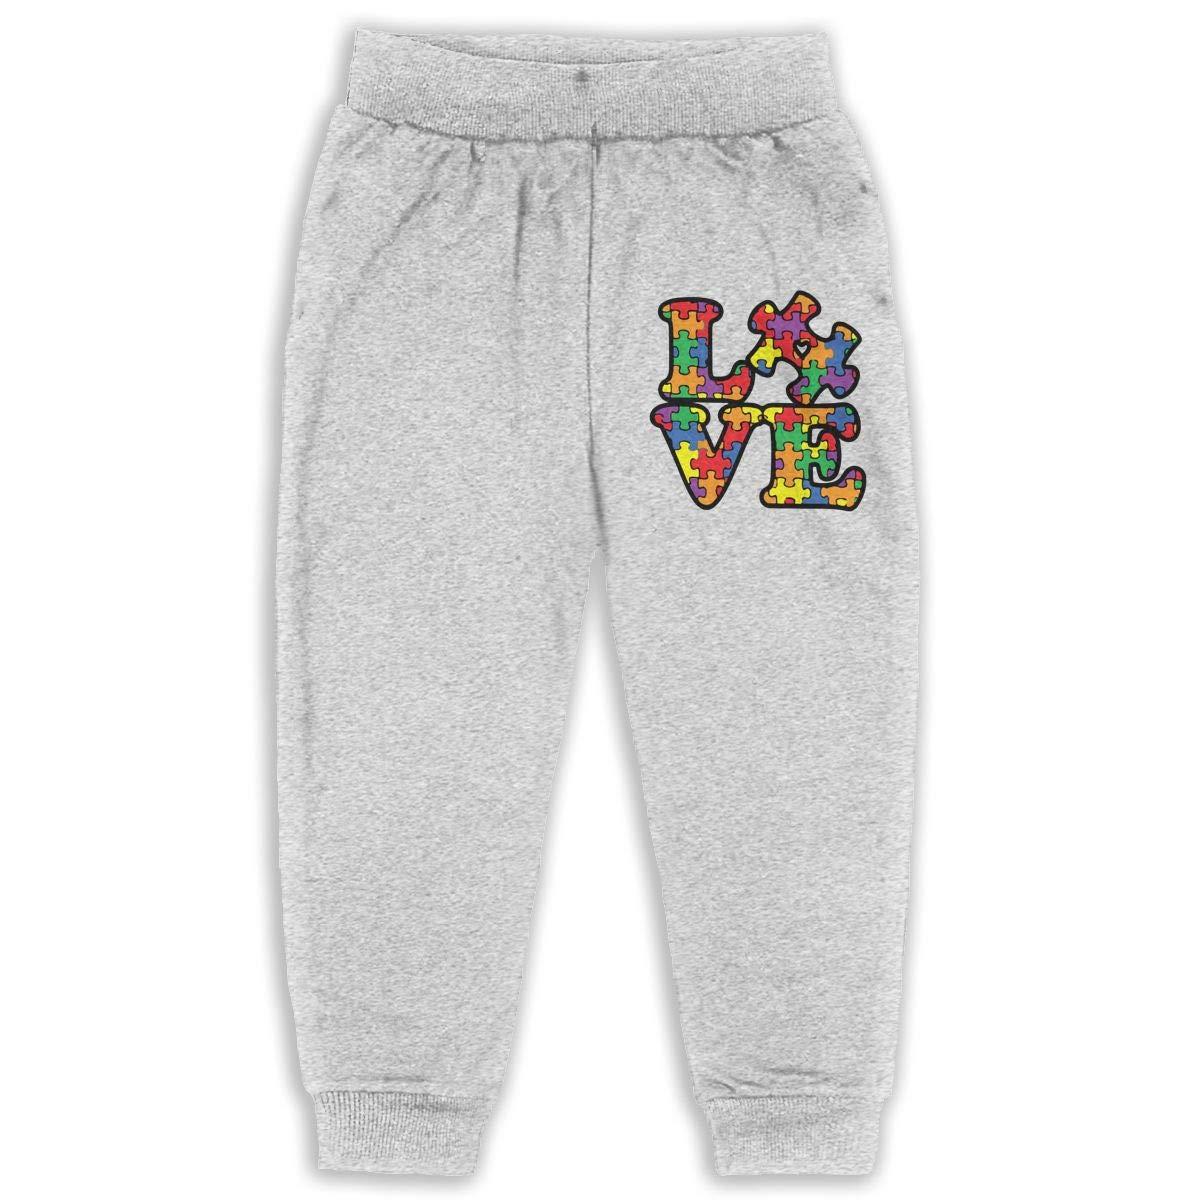 Classic Baby Boy Elastic Trousers Autism Awareness Unisex Baby Pants